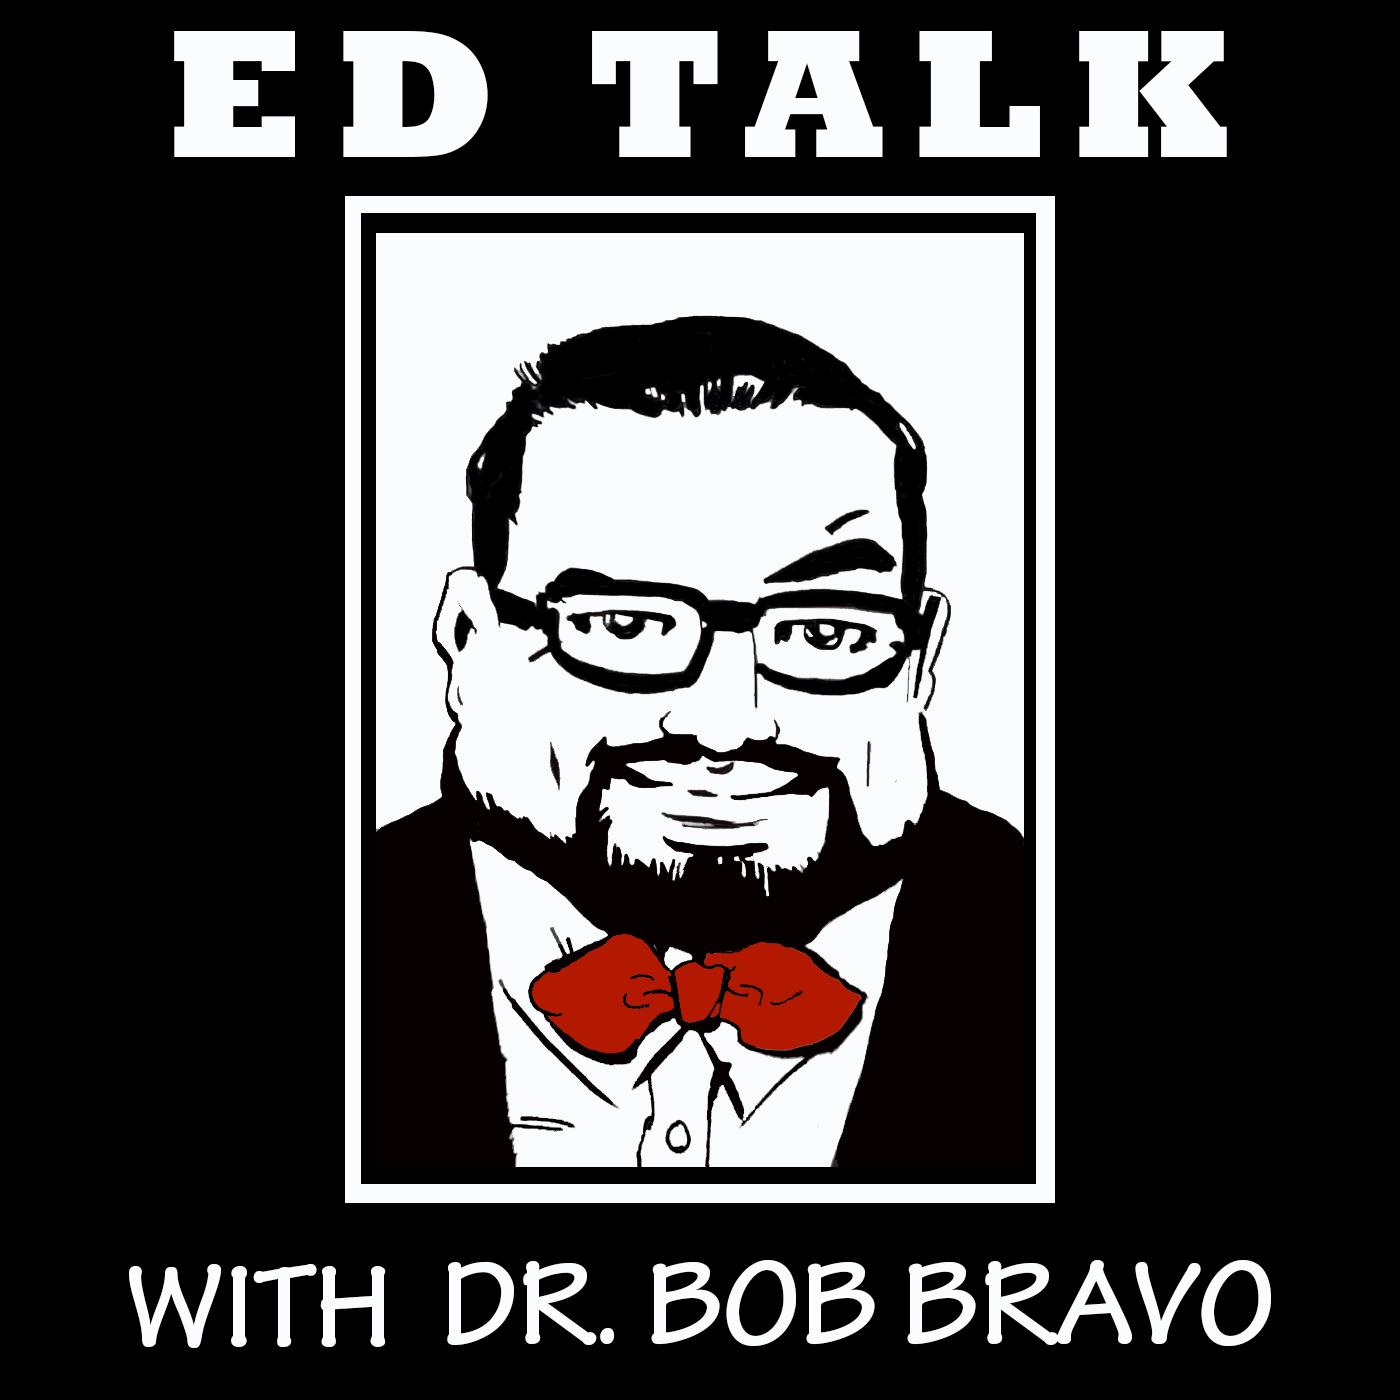 Ed Talk with Dr. Bob Bravo show art